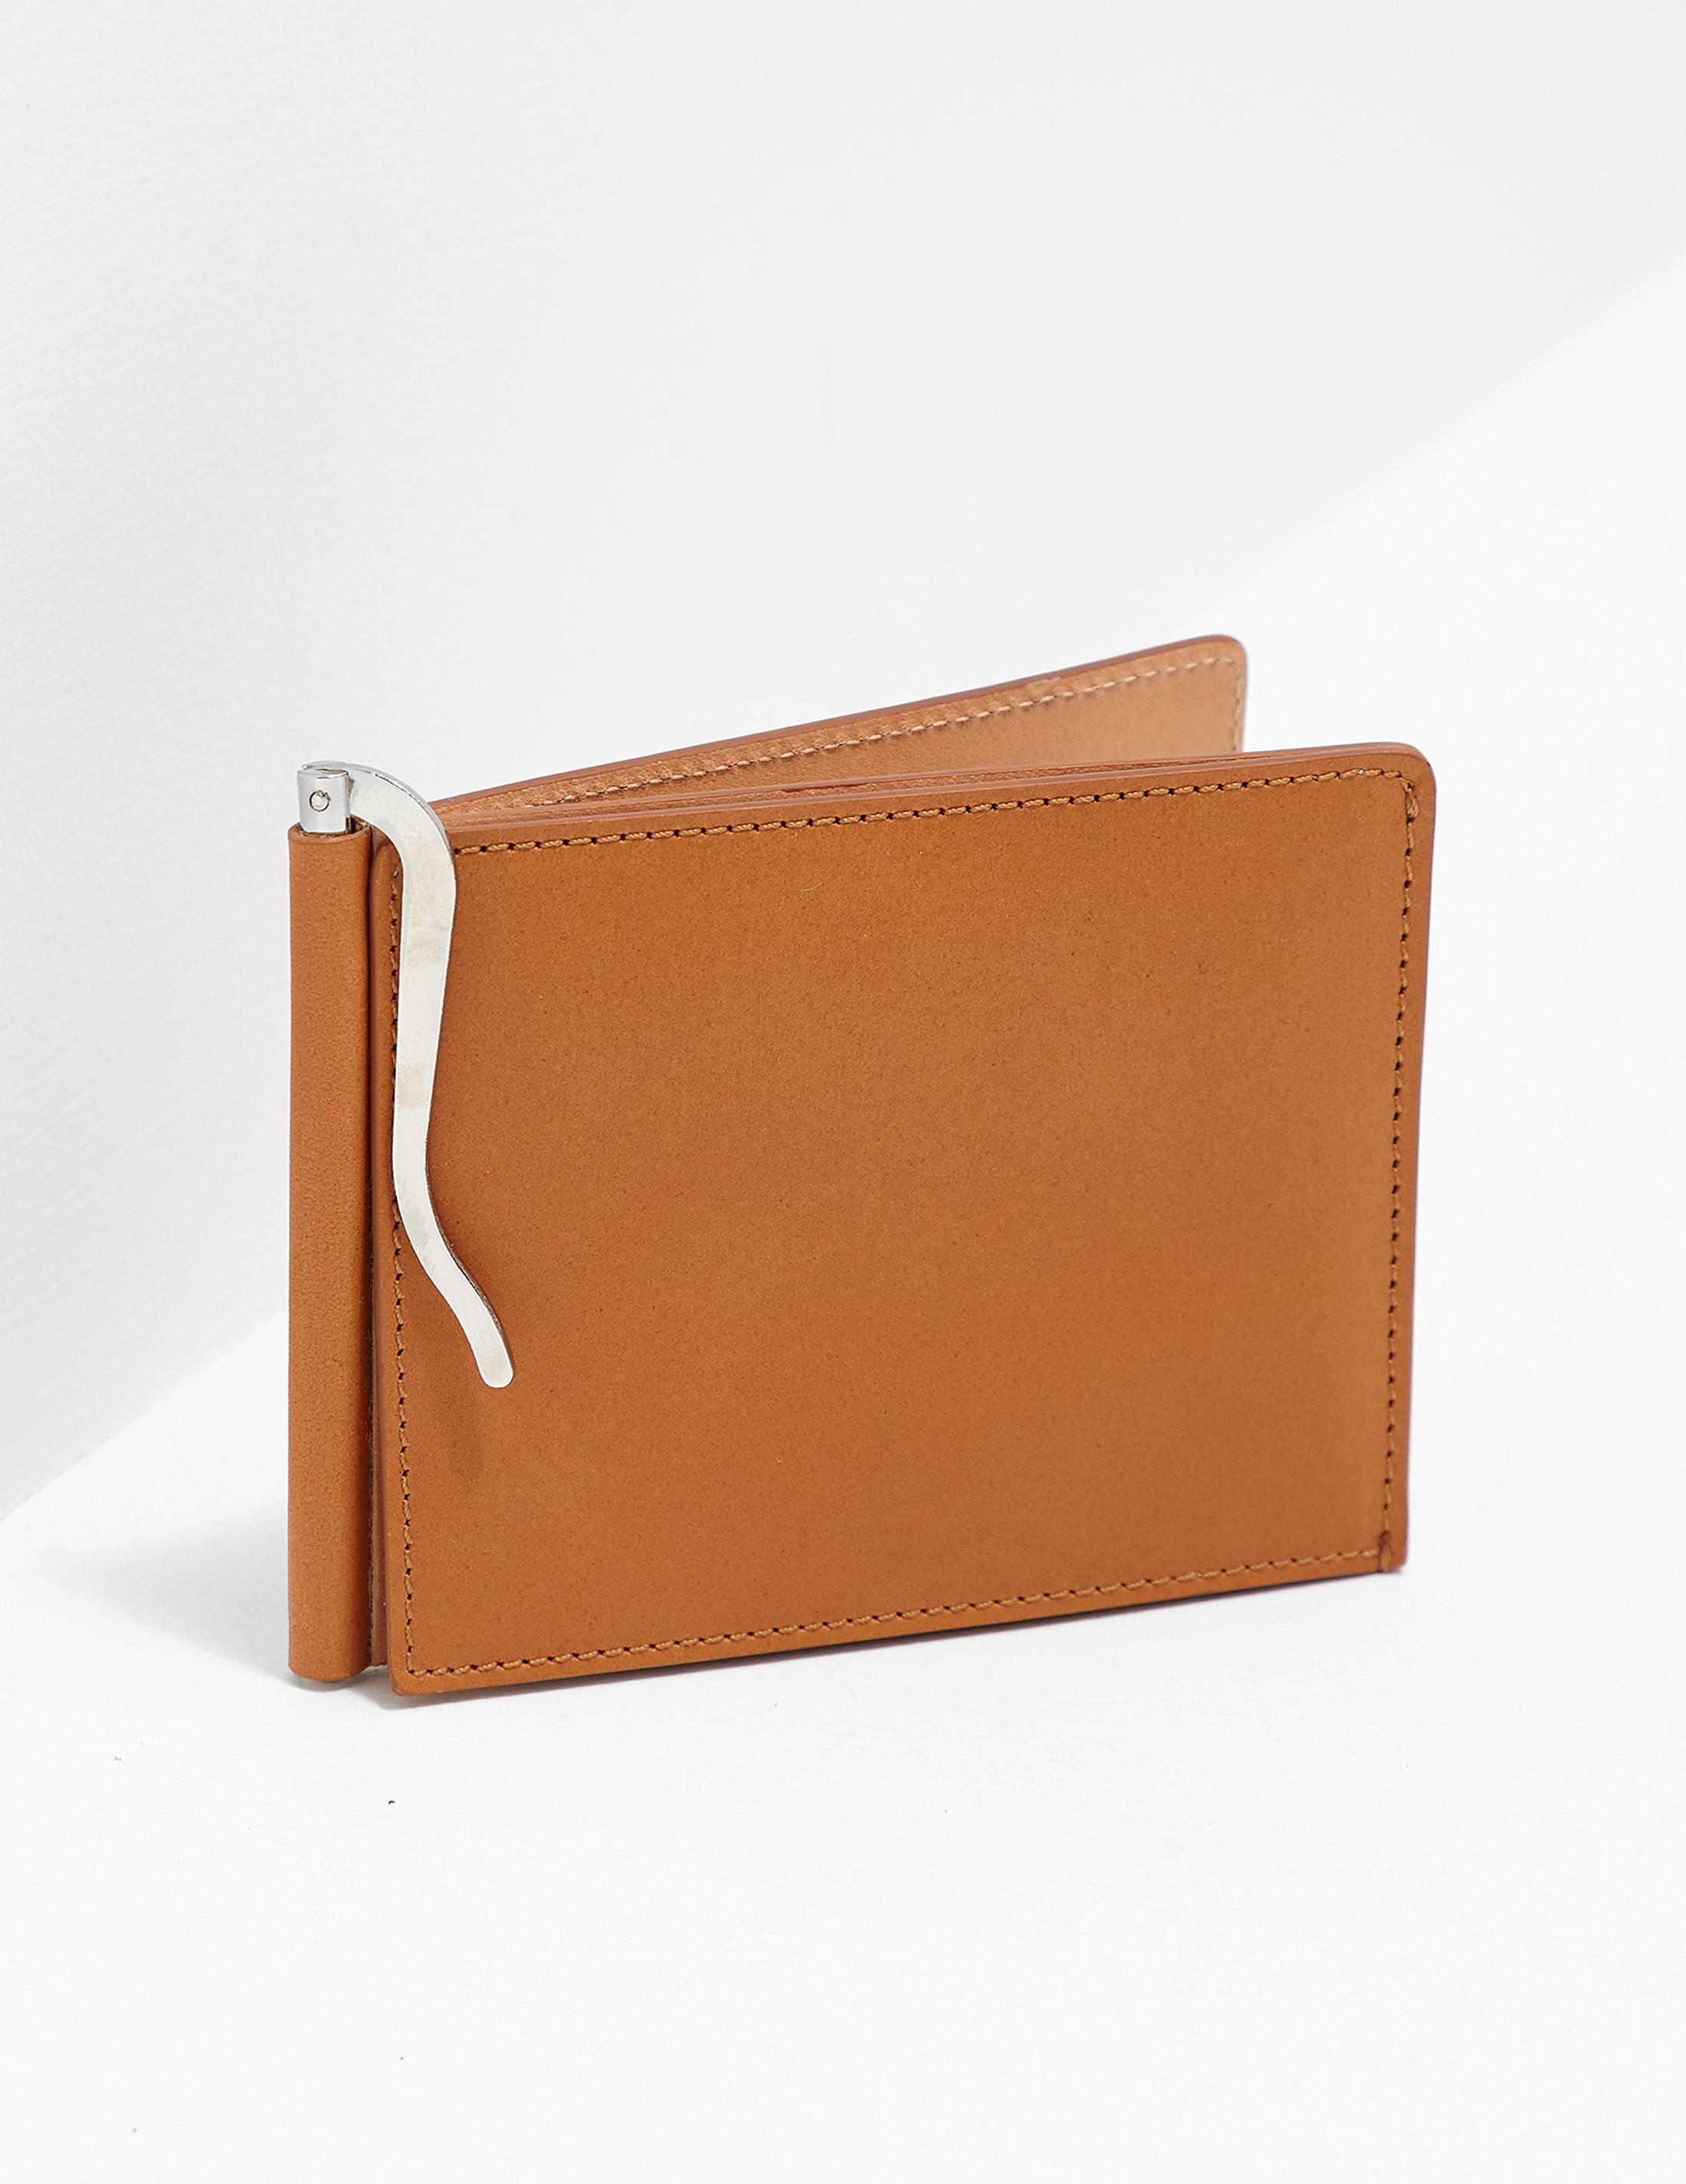 Maison Margiela Fold Card Holder